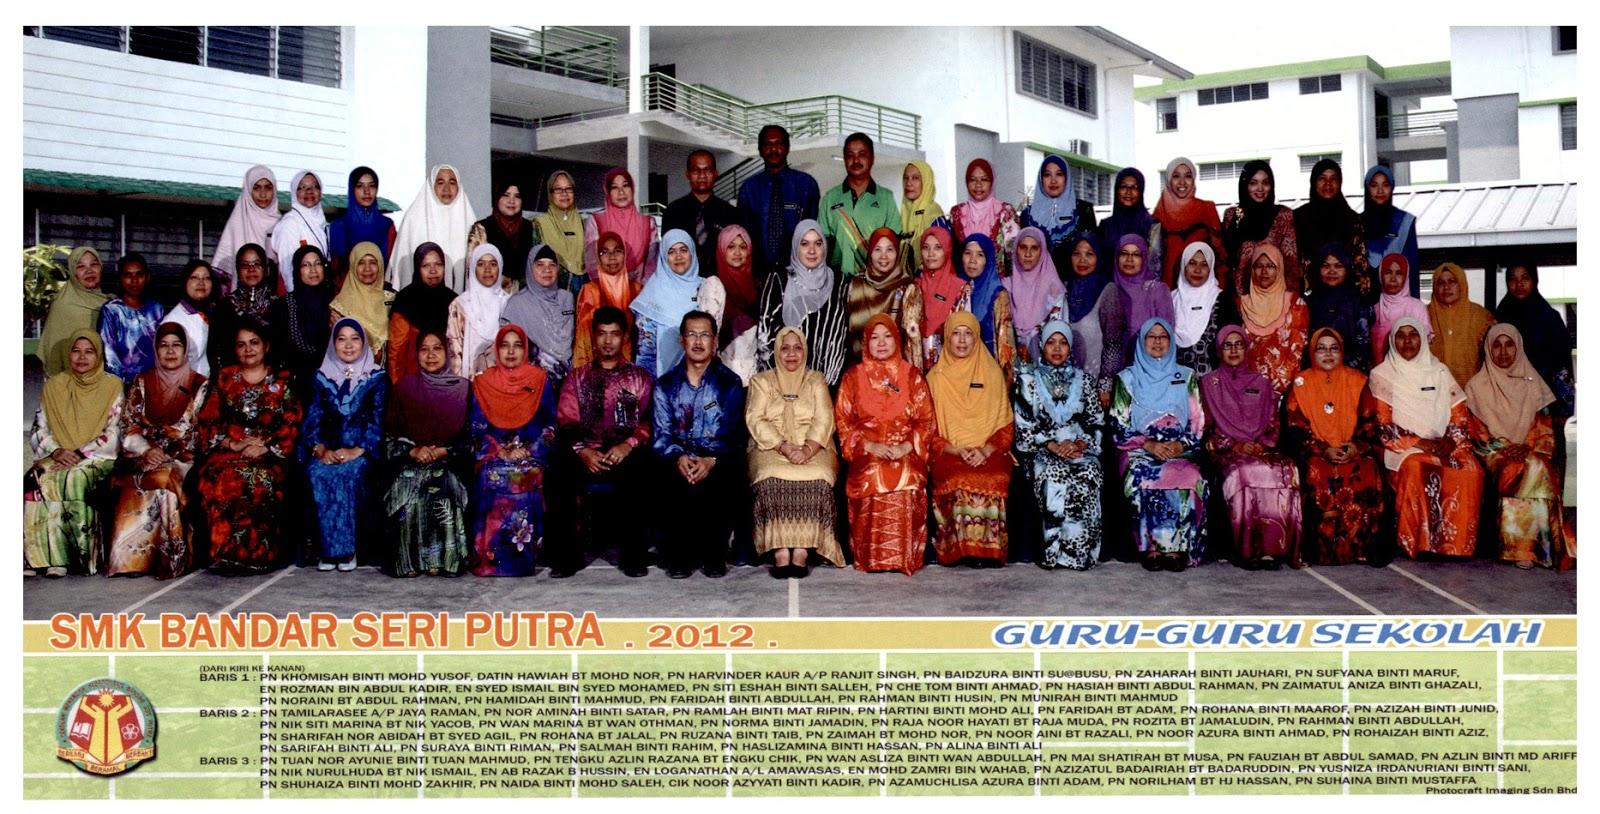 Sekolah Kebangsaan Bandar Seri Putra Kronis M